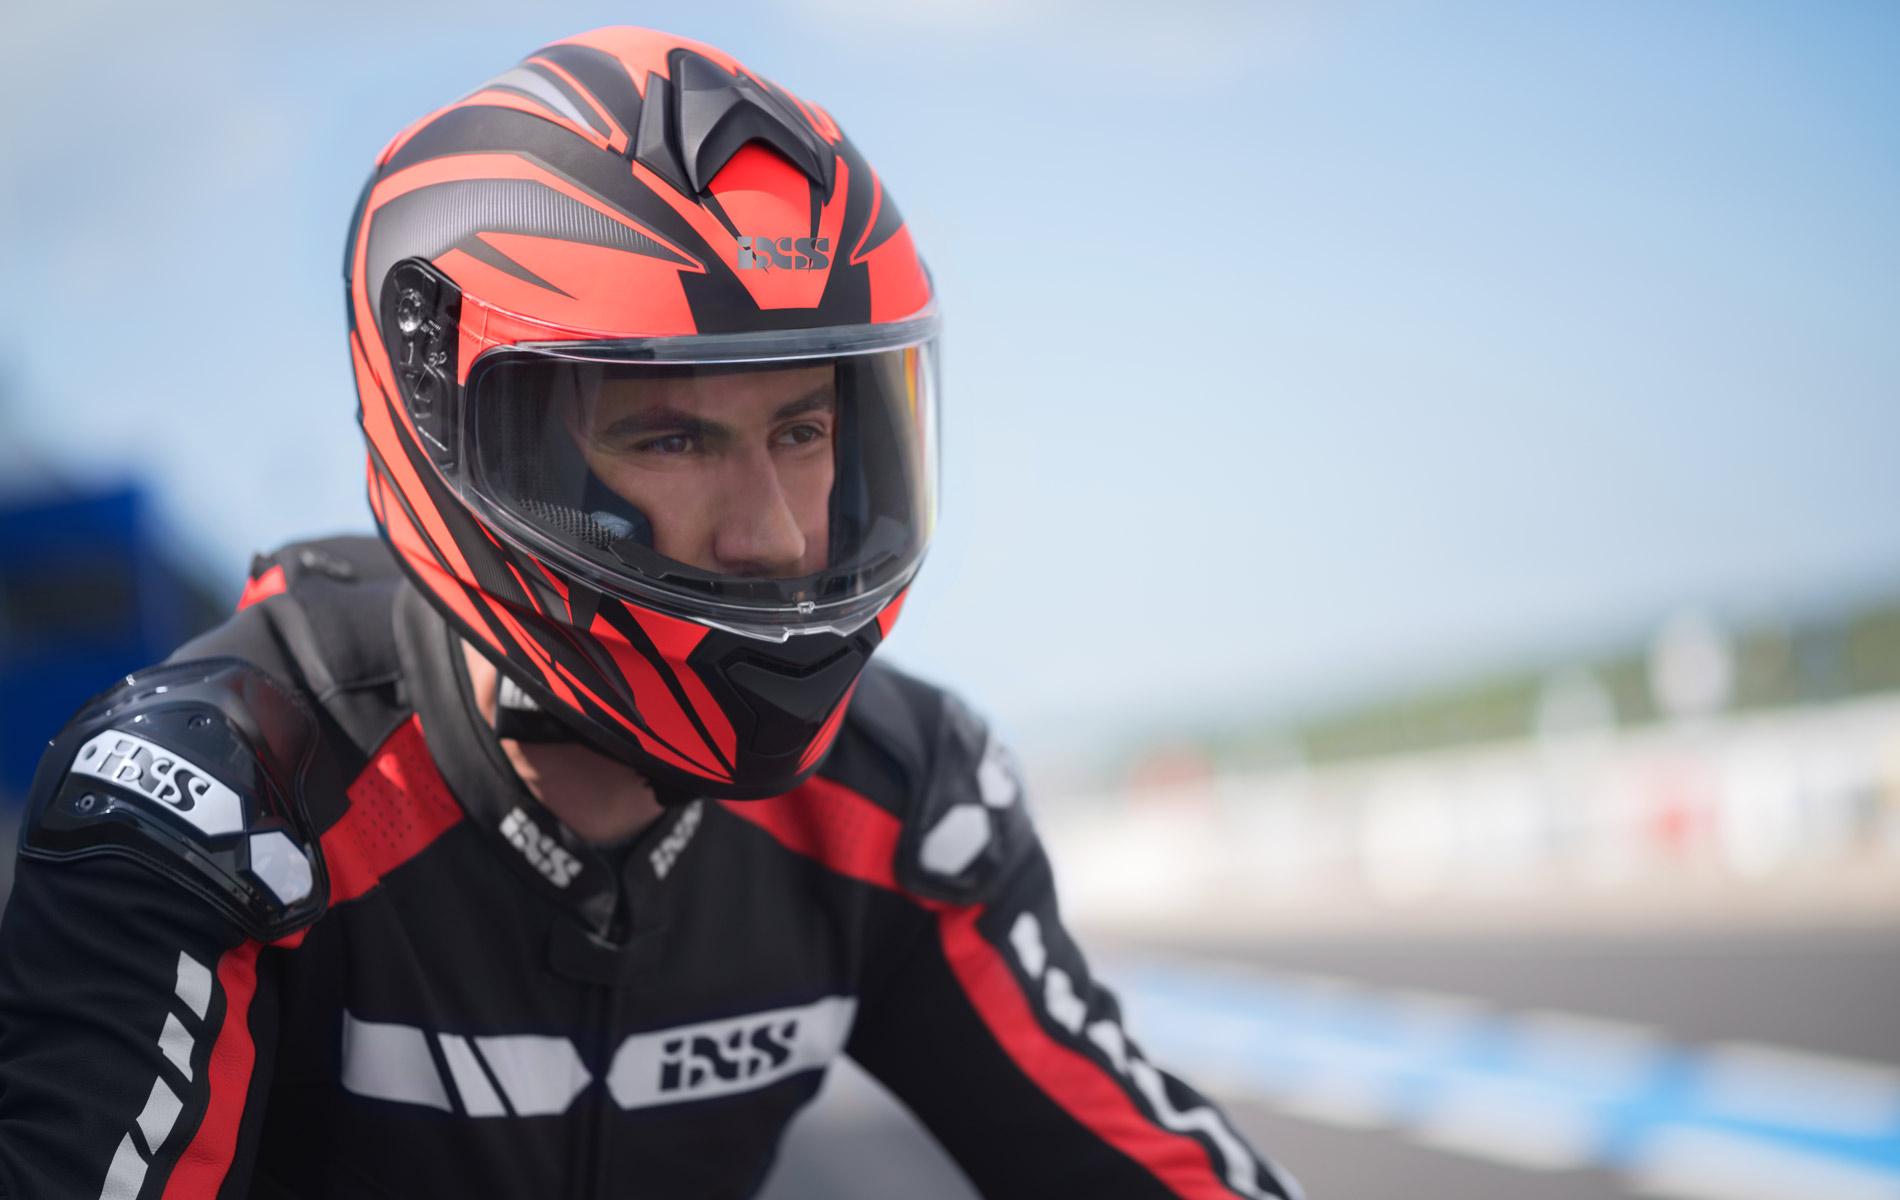 iXS Motorradbekleidung